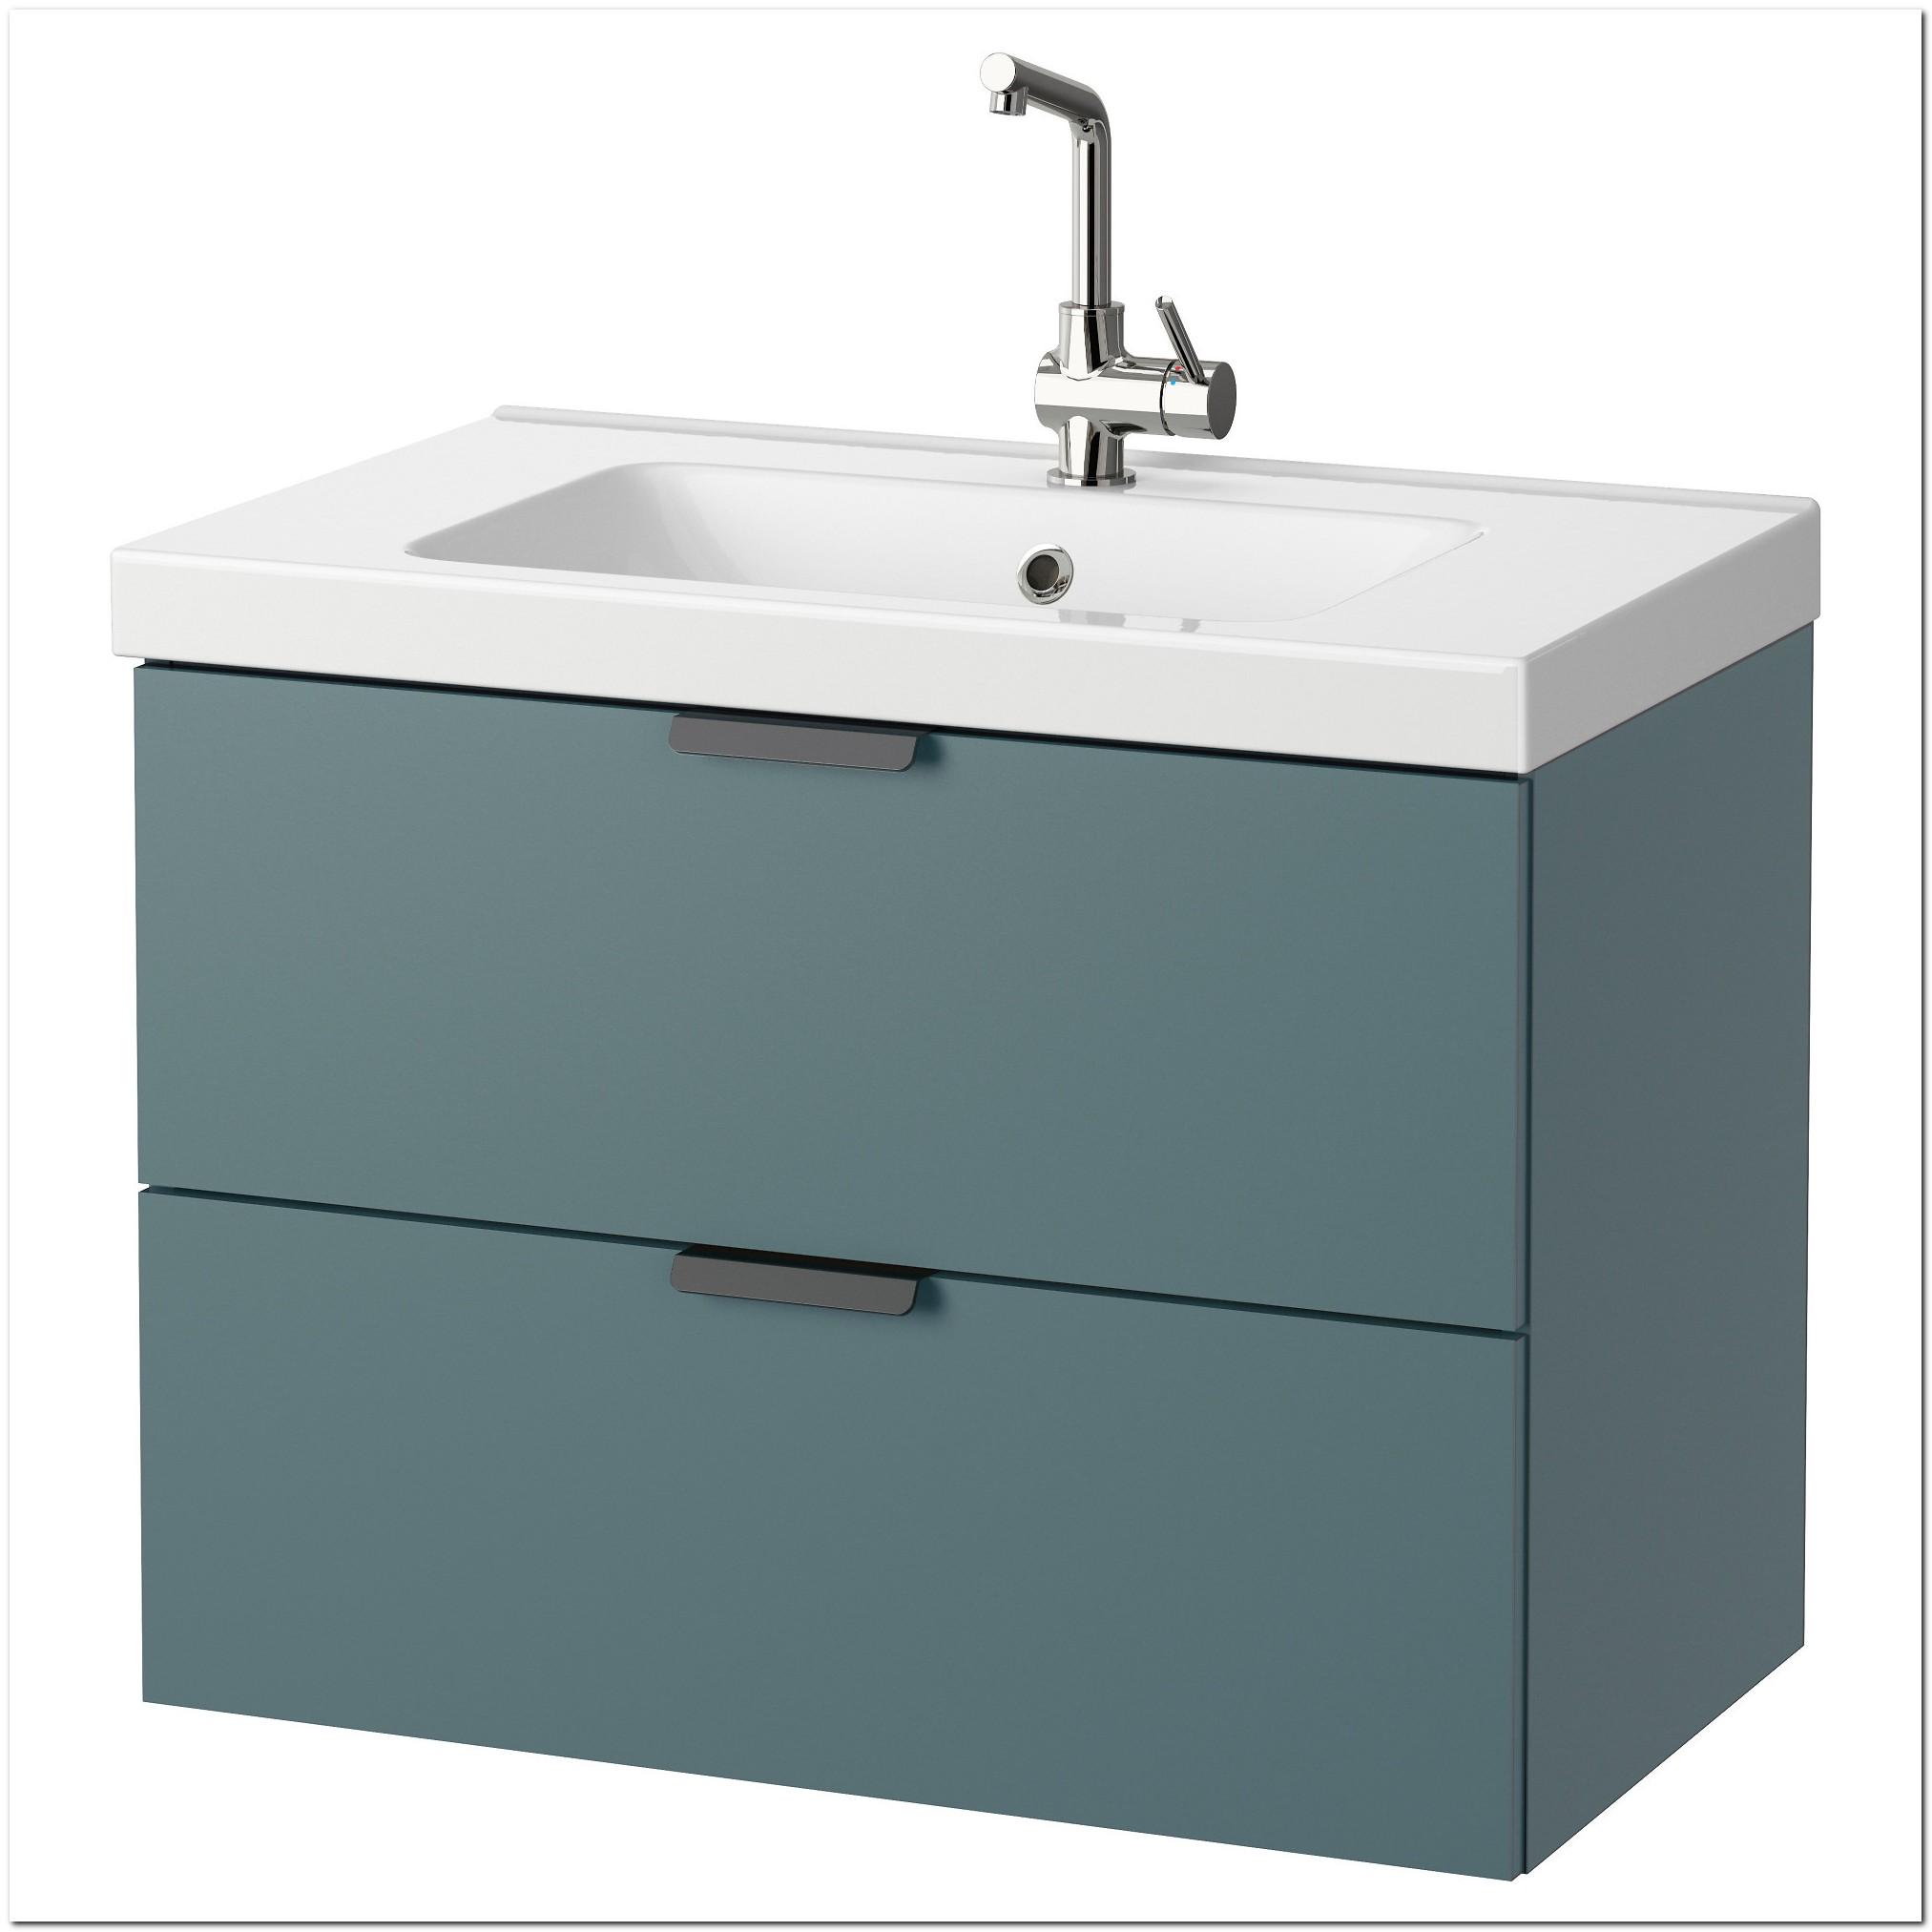 Ikea Double Sink Vanity Unit